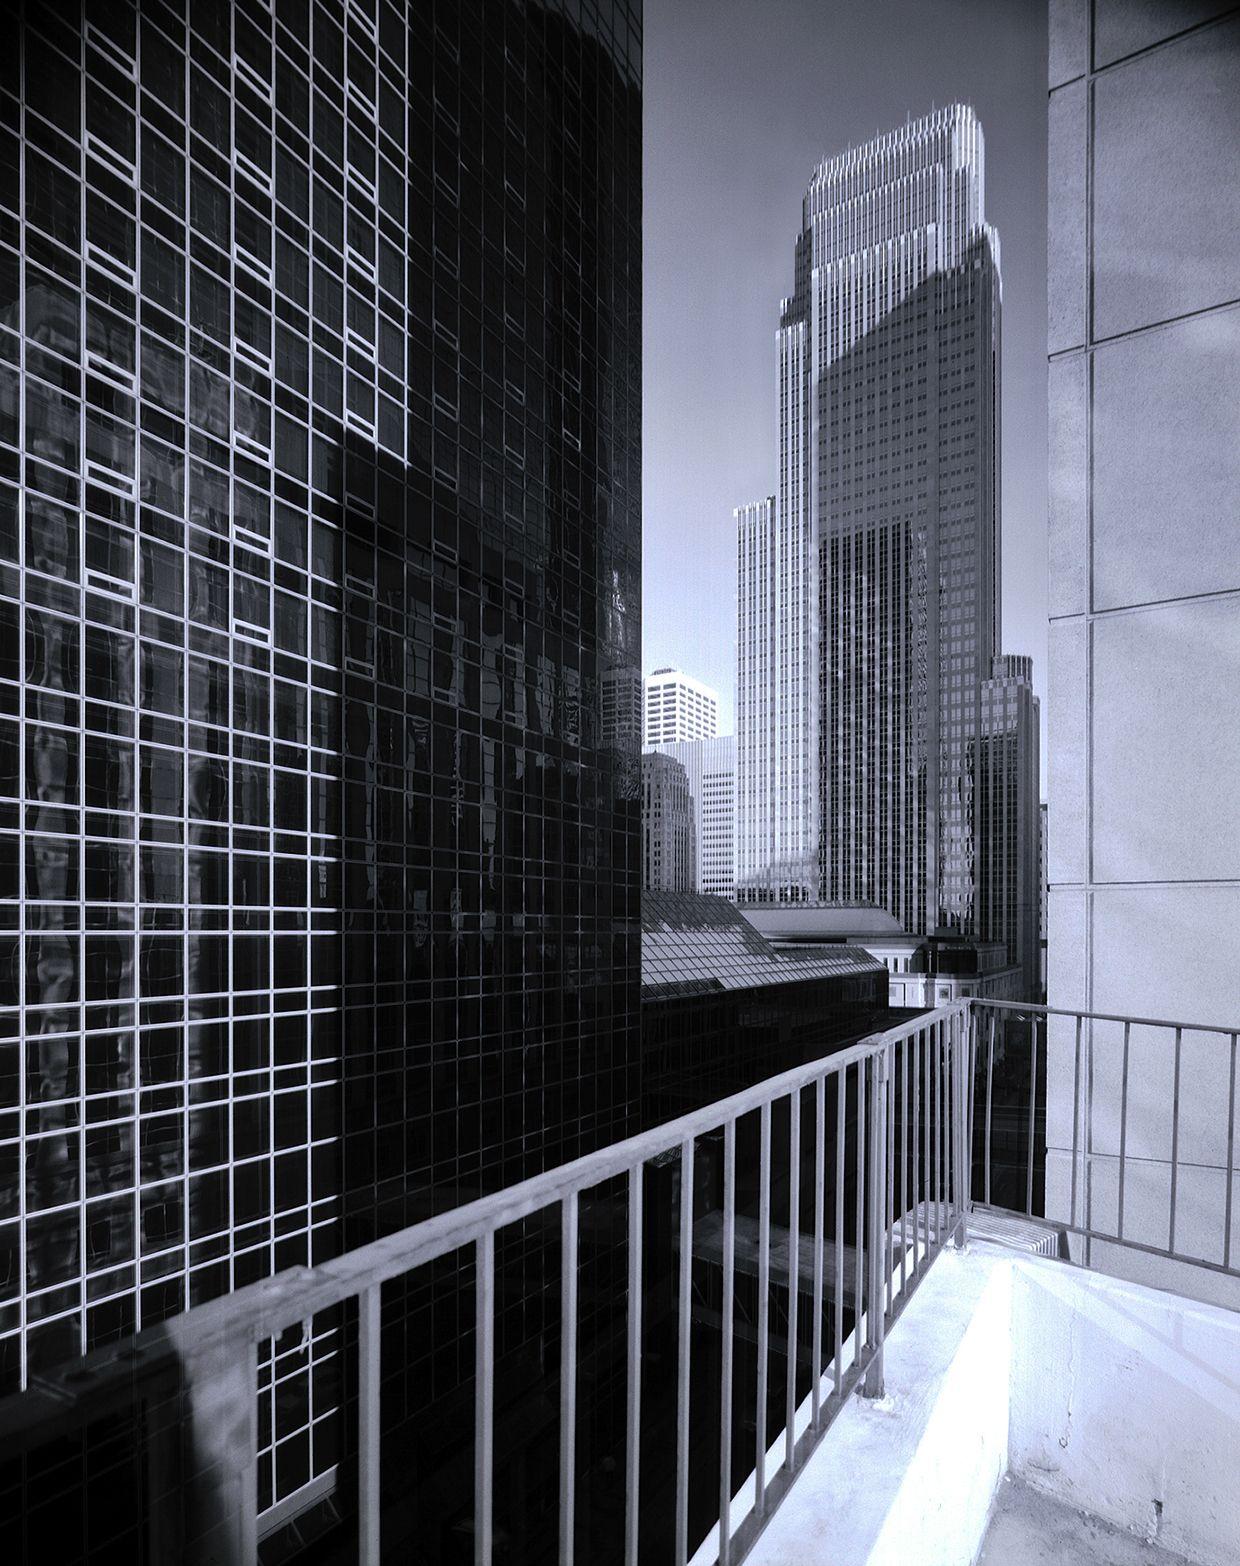 Pete Sieger  Architectural Photographer